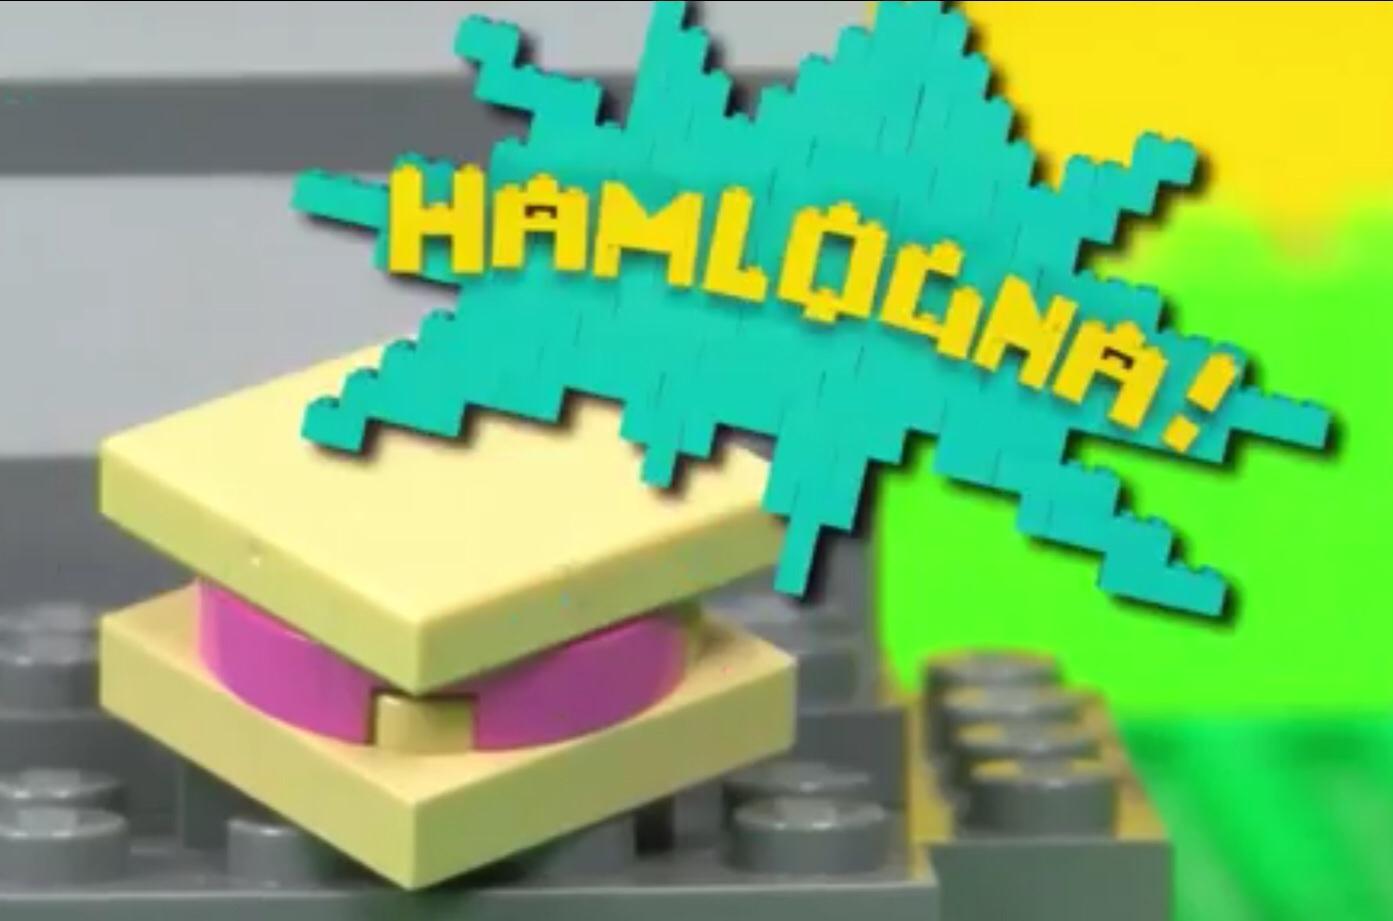 Hamlogna Sandwich/Gallery